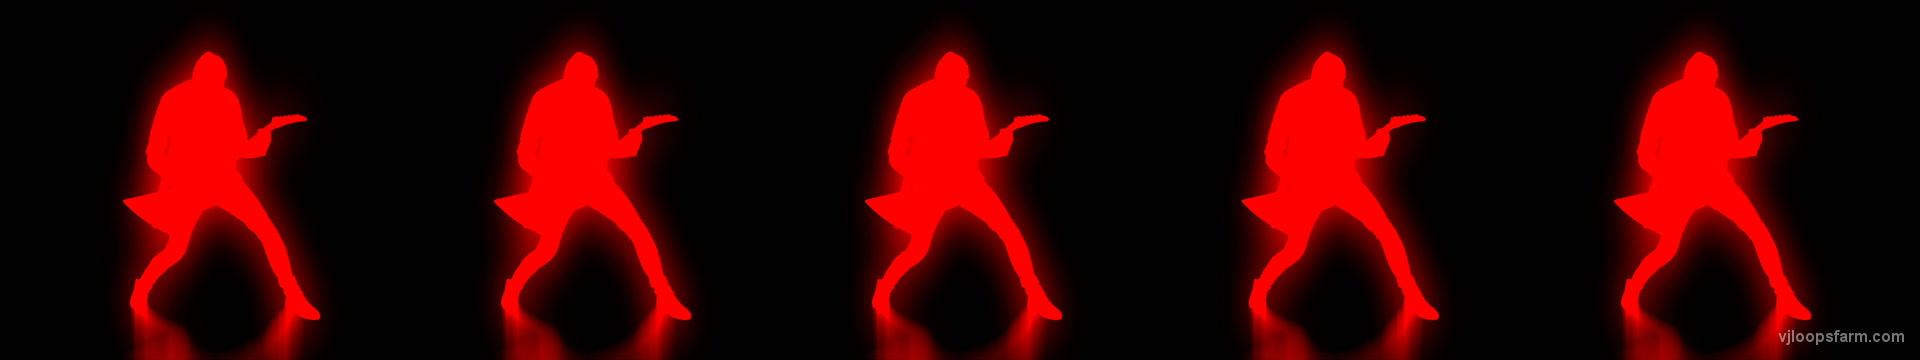 vj video background Ultra-Wide-Rock-Guitarist-strobing-pattern-VJ-Footage-Video-Loop_003